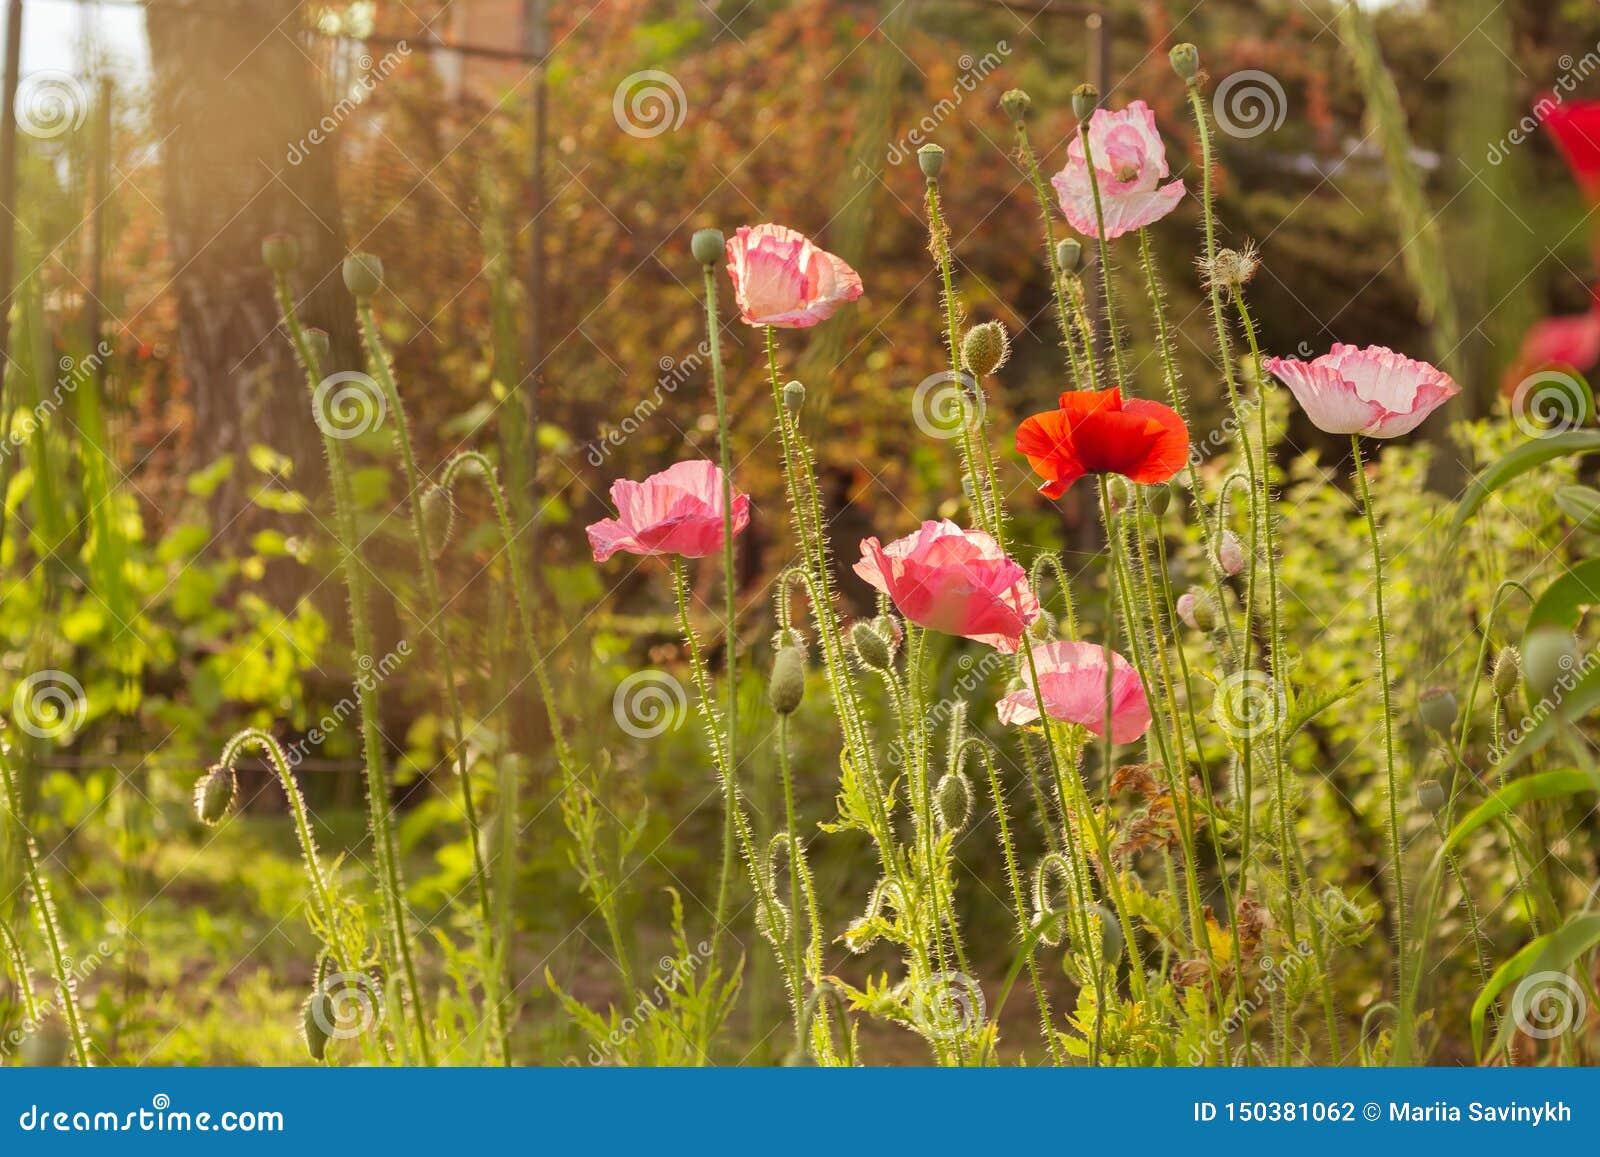 Summer scene with bright red poppy flowers field, golden sunshine. Summer wallpaper background